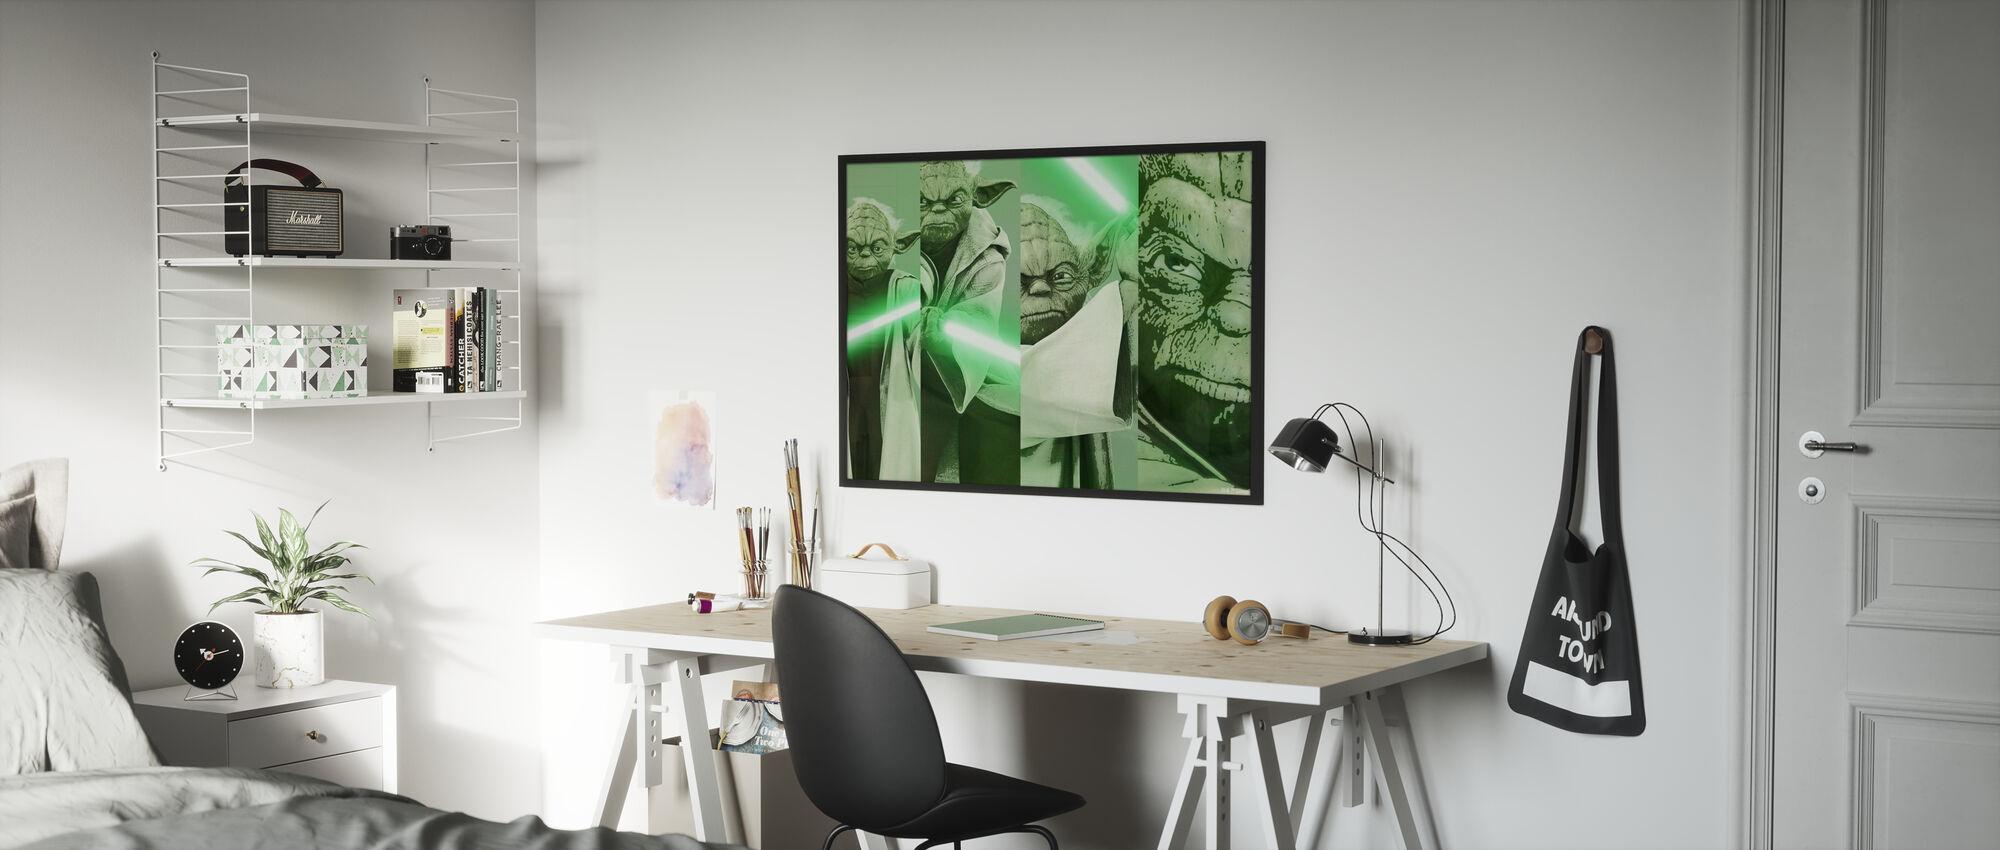 Star Wars - Yoda x 4 - Innrammet bilde - Barnerom